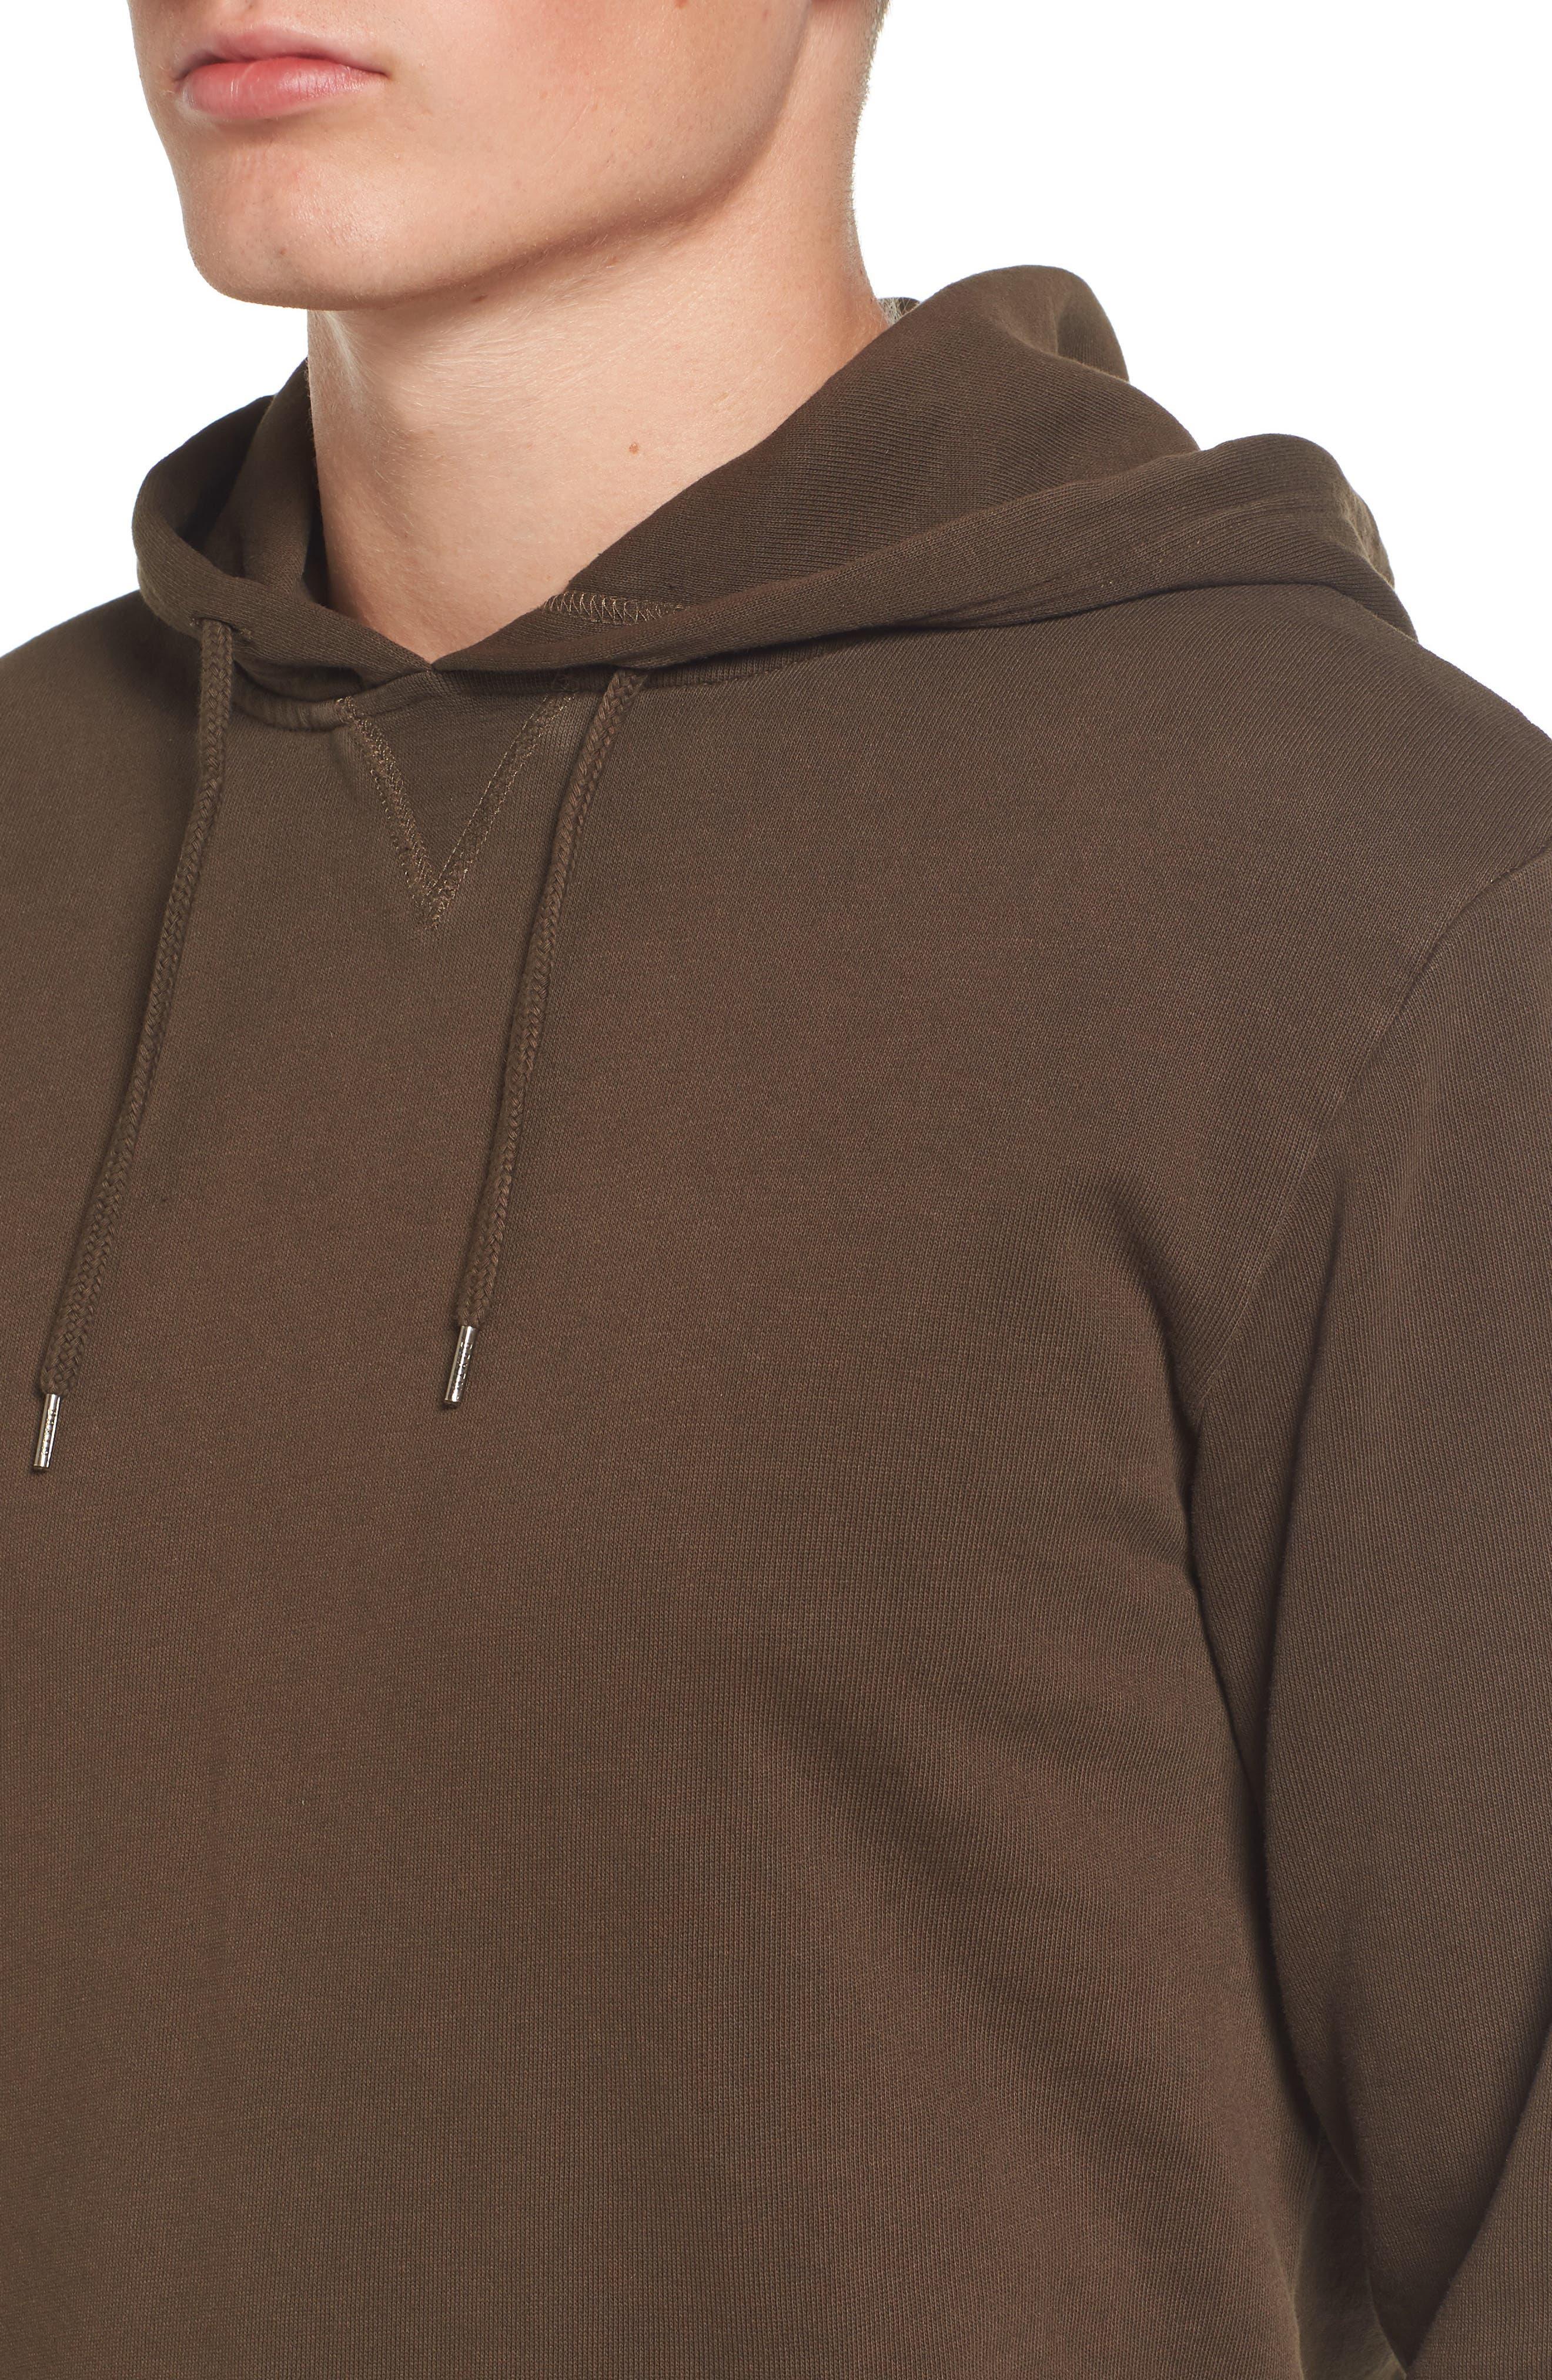 Hooded Fleece Sweatshirt,                             Alternate thumbnail 4, color,                             210